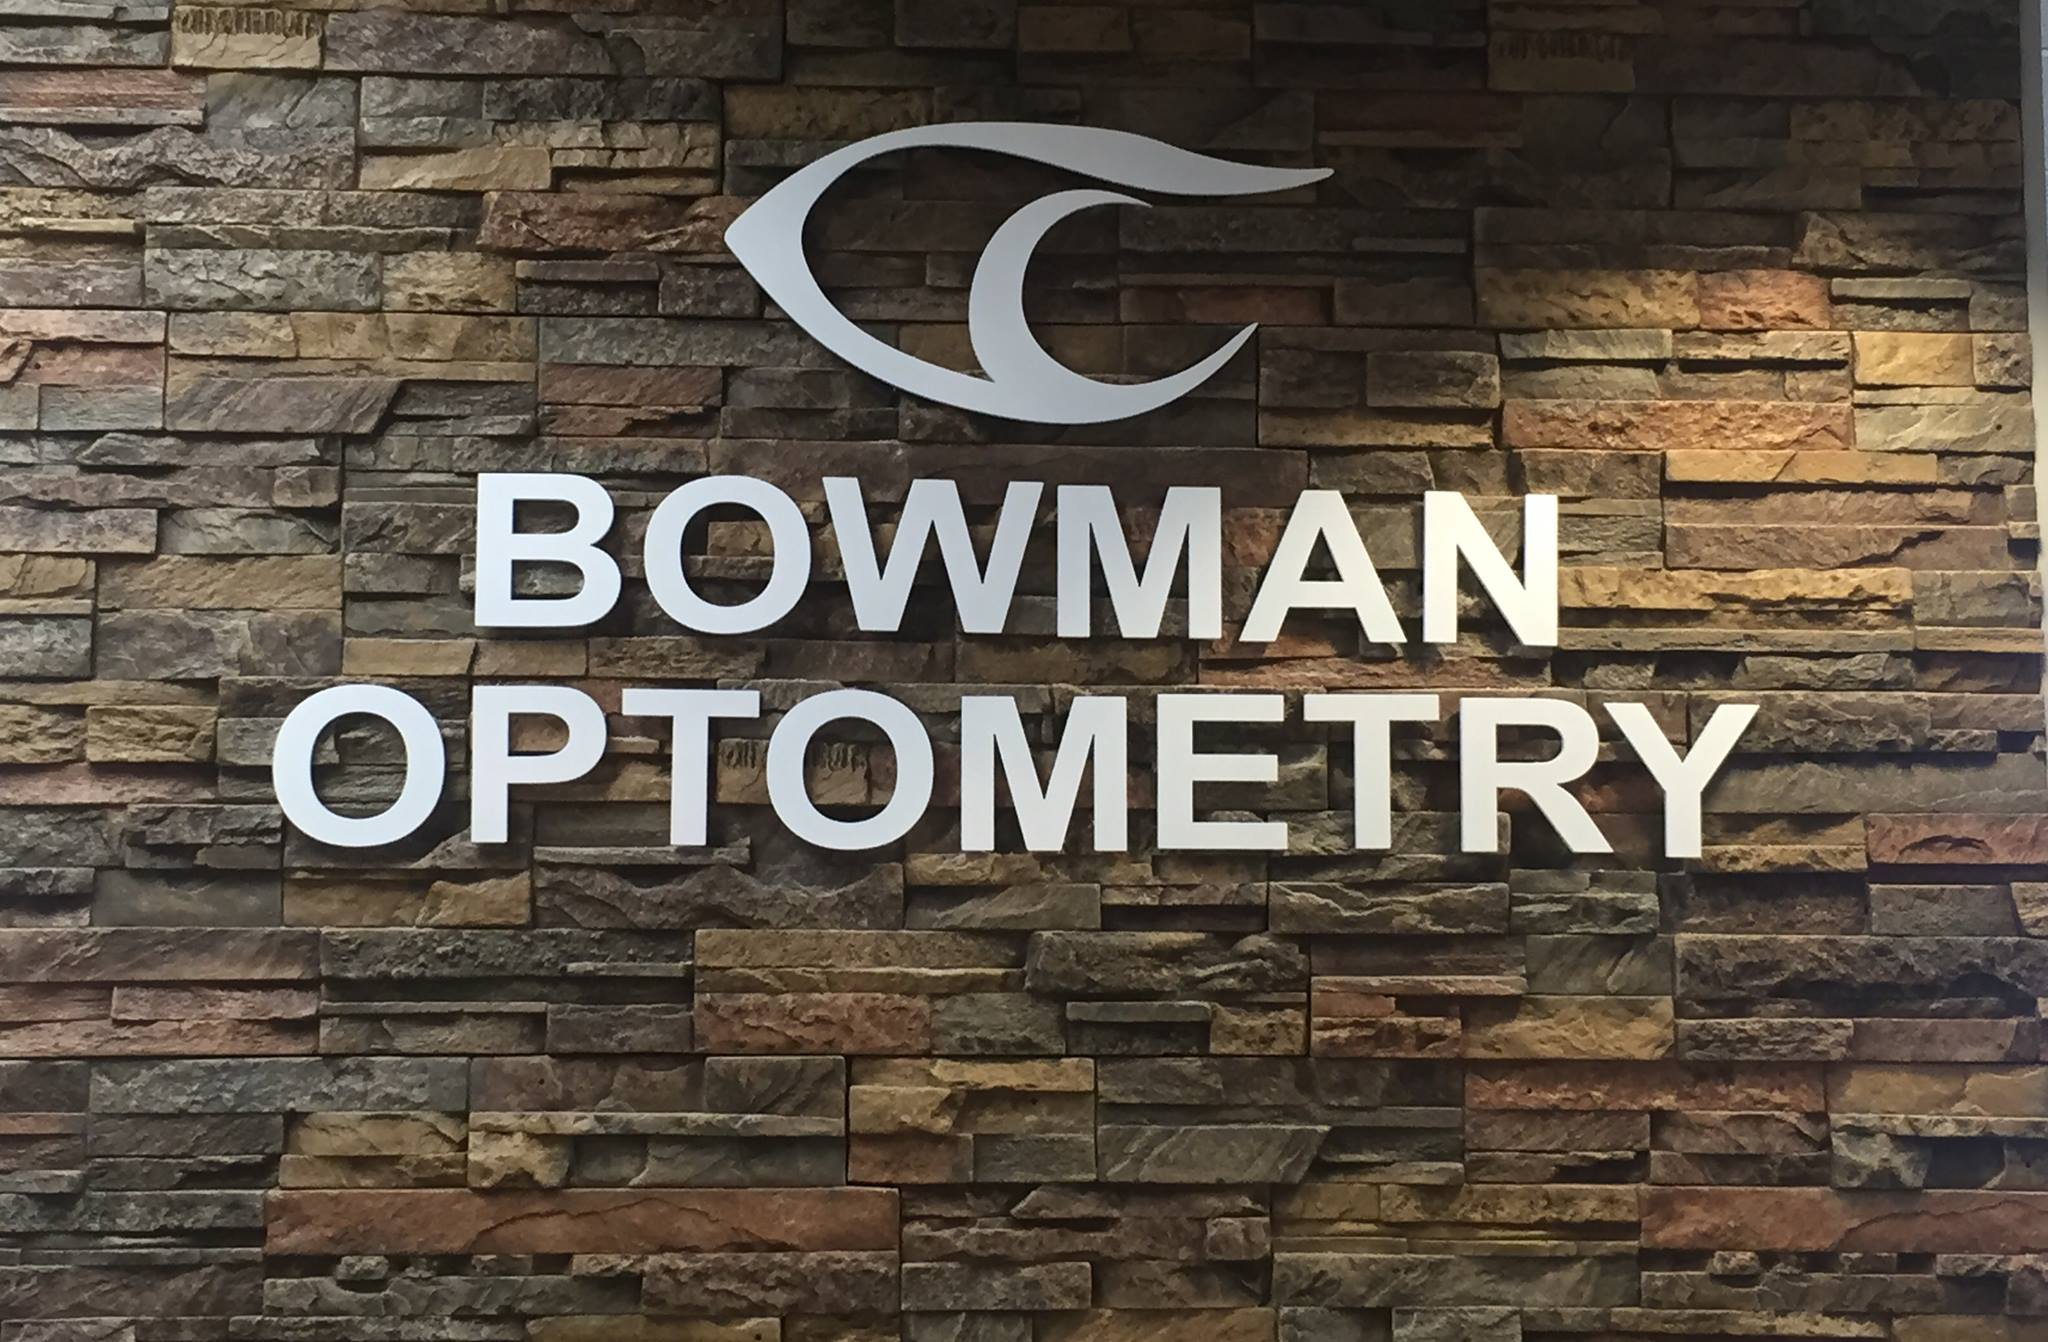 Bowman Optometry 120 A1a N, Ponte Vedra Beach, FL 32082 - YP com